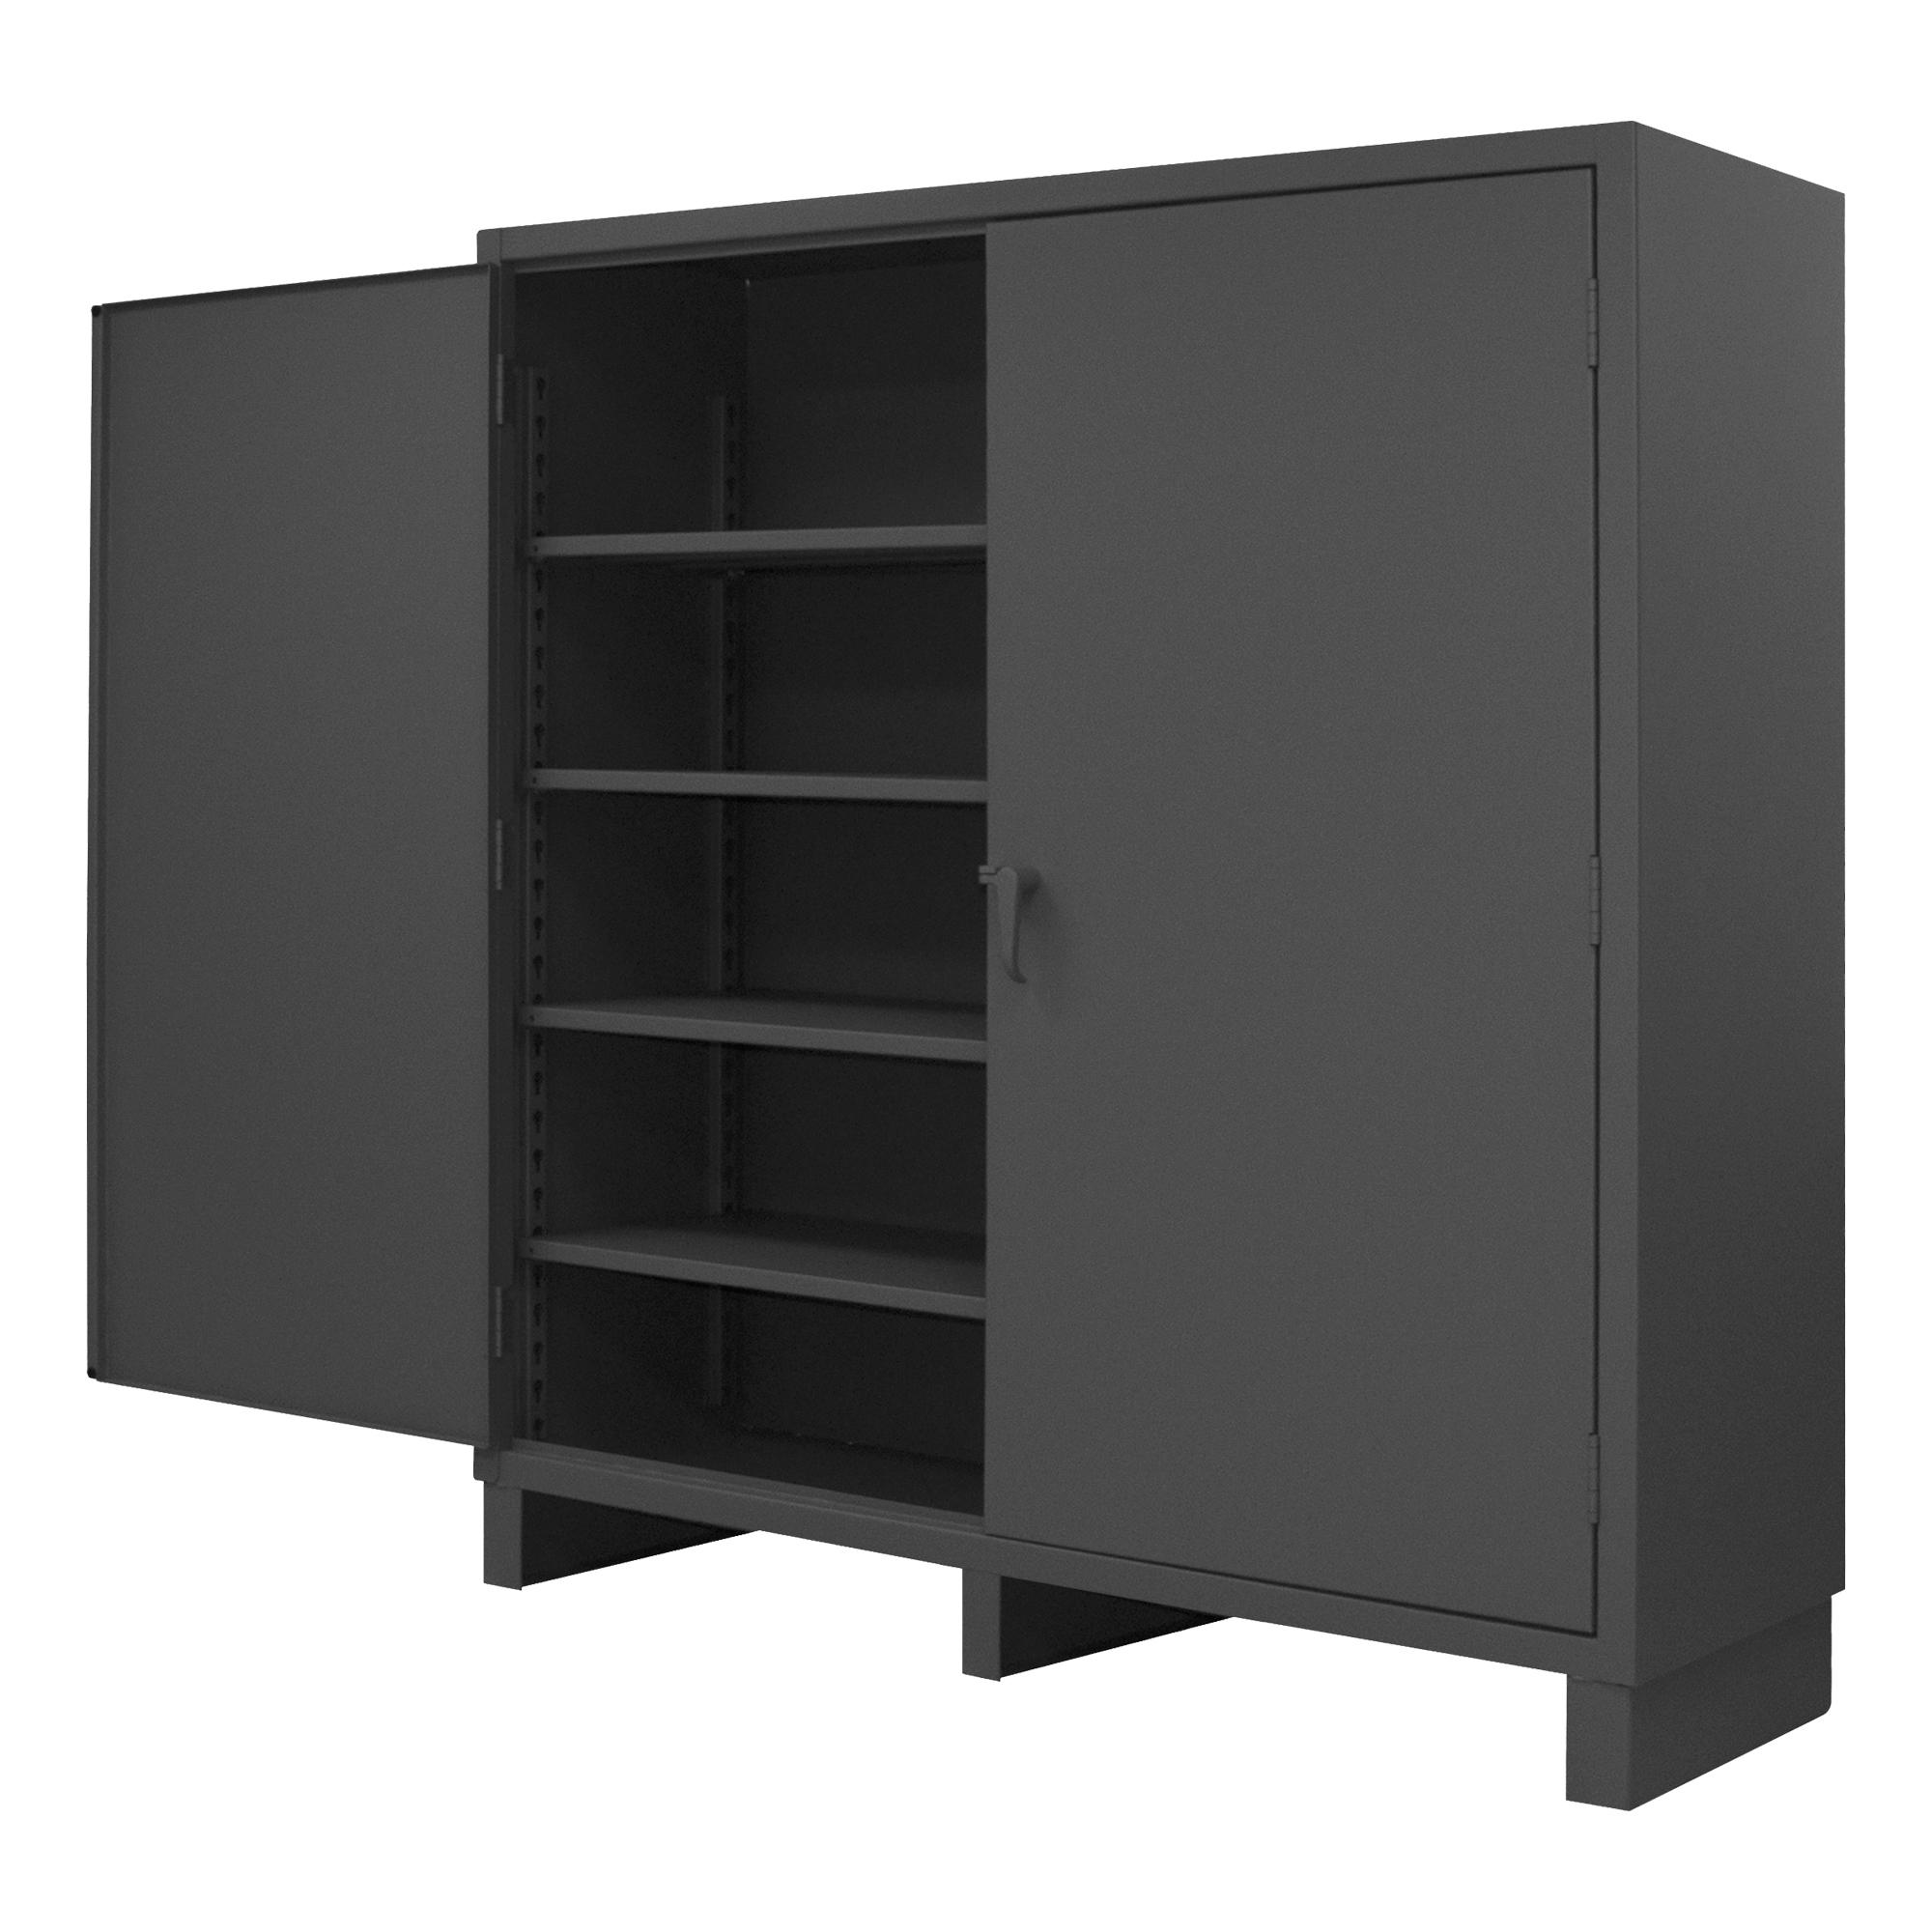 Cabinet 12 Gauge 4 Shelves 60 X 24 X 78 Durham Manufacturing